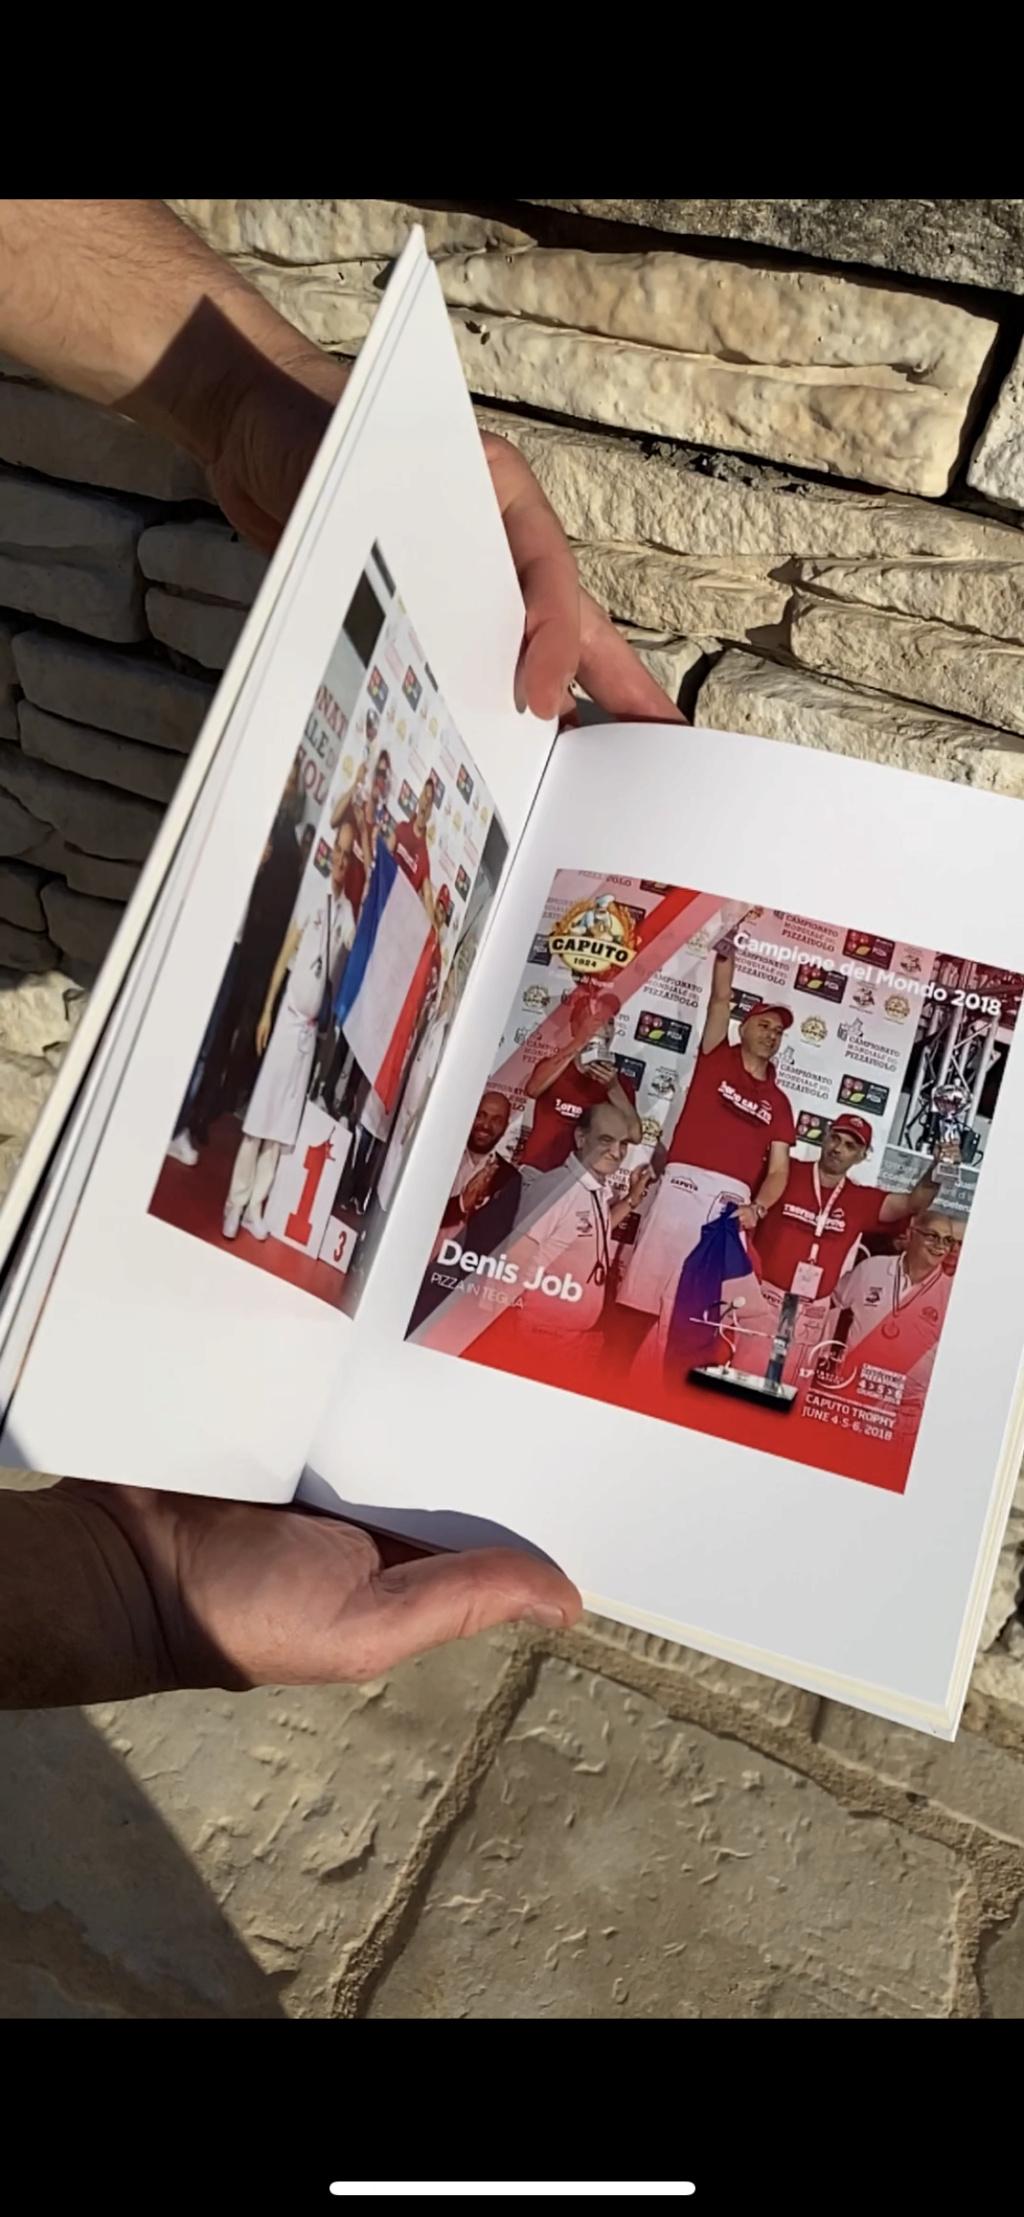 un livre JOBI PIZZA & Denis JOB  697d8a10